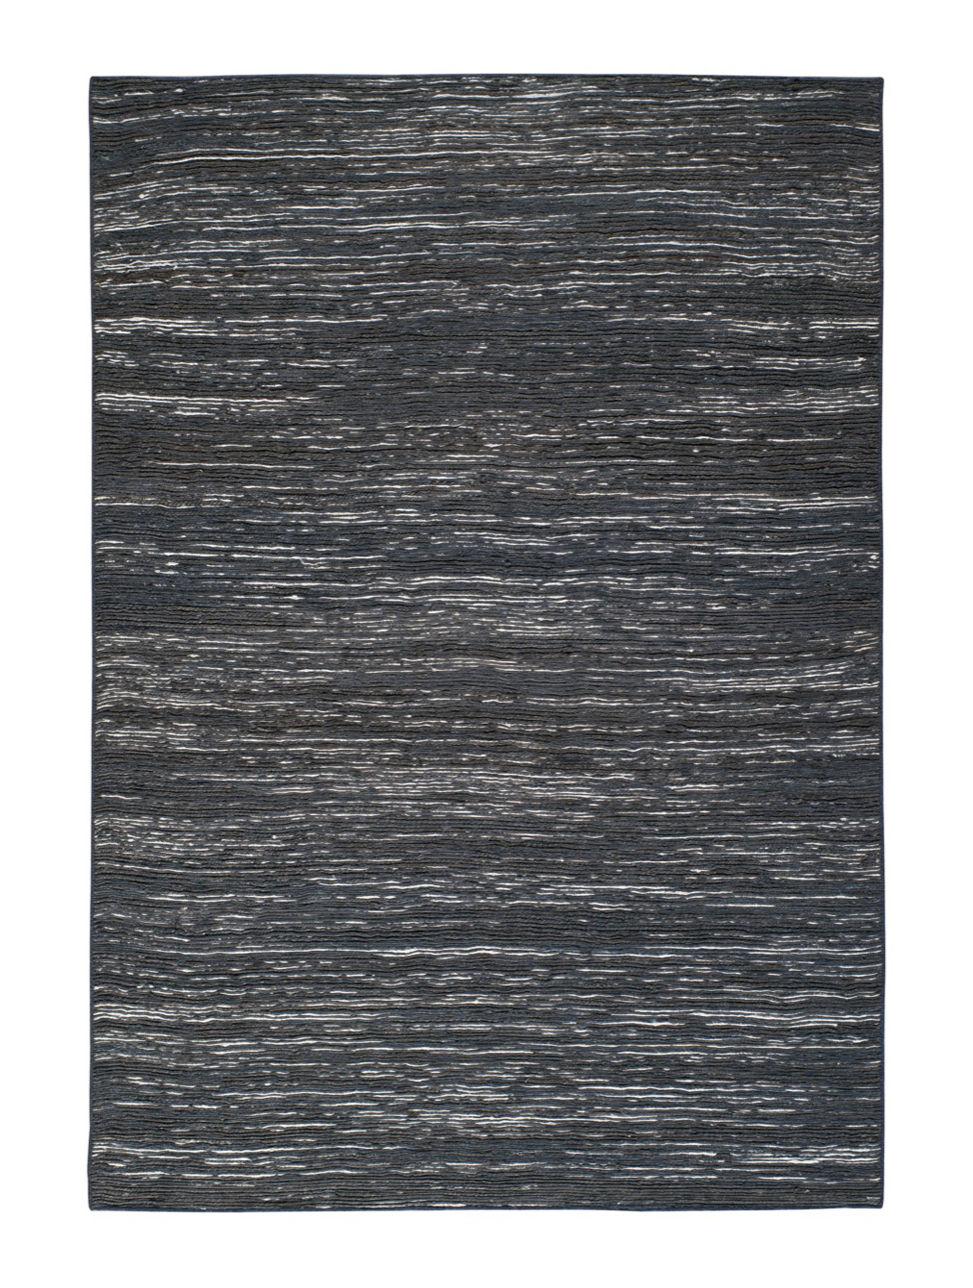 Dekoration - Teppiche - Vulcano Teppich / 170 x 240 cm - Toulemonde Bochart - Schwarz - Baumwolle, Jute, Soie végétale